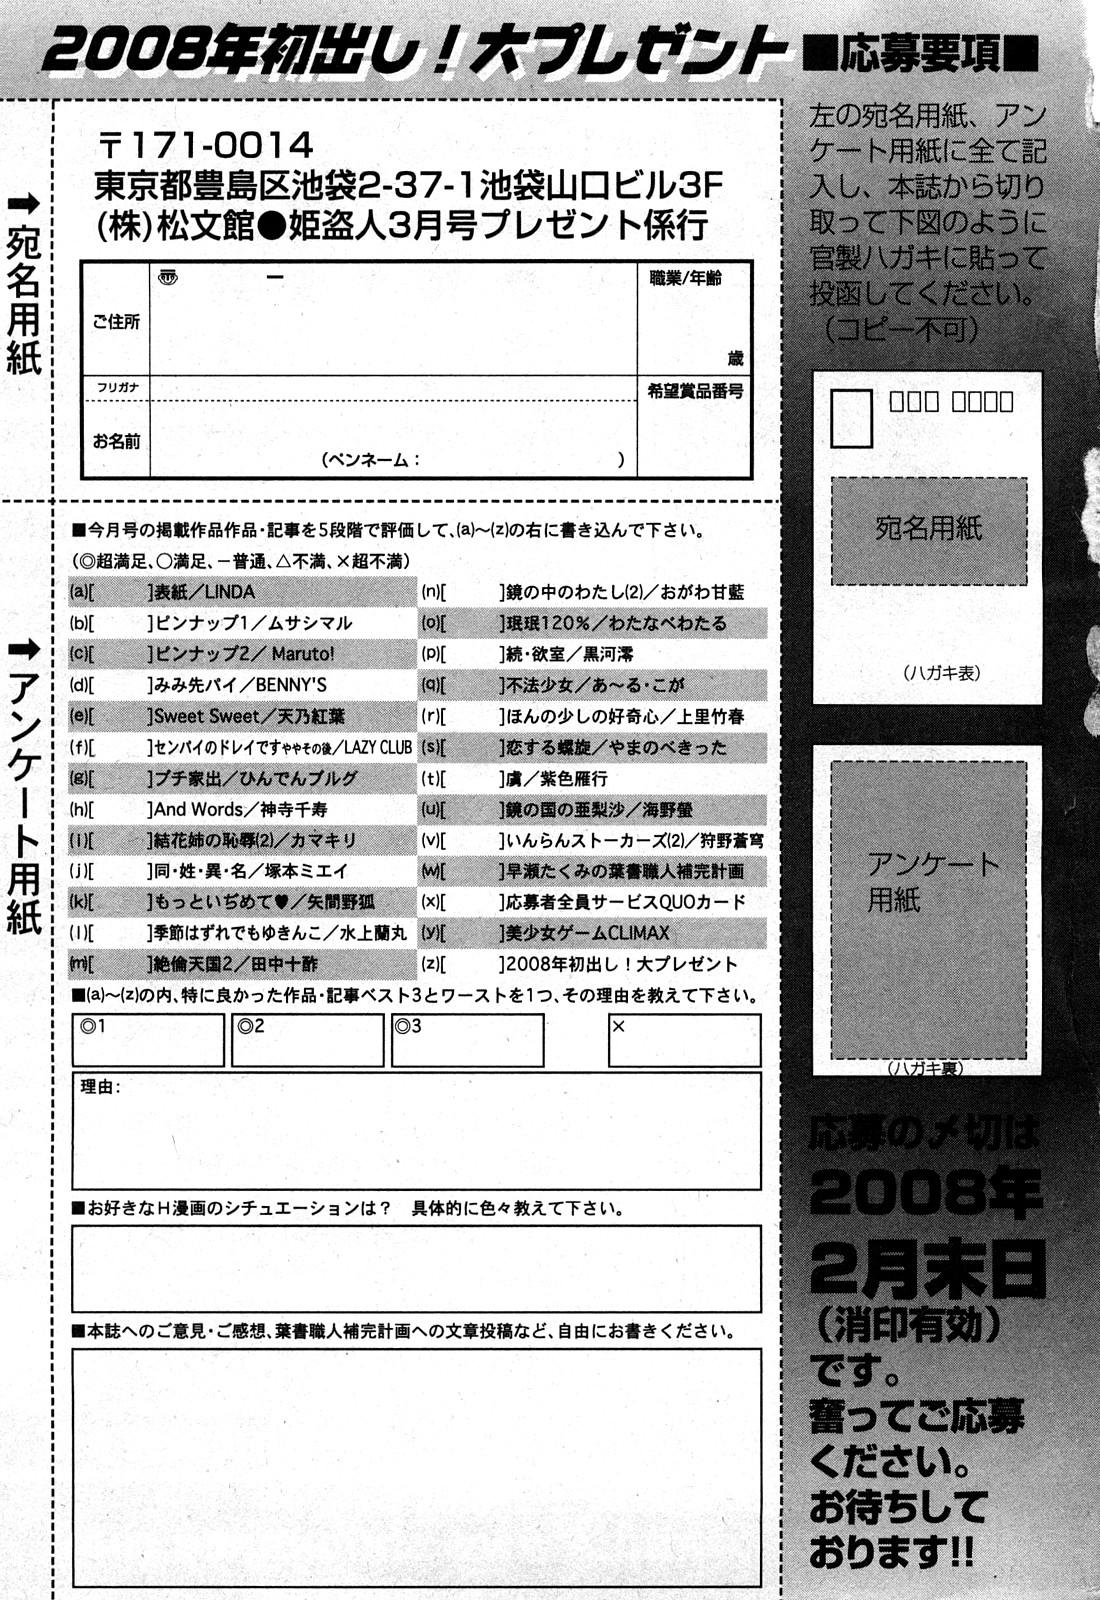 COMIC Hime Dorobou 2008-03 327